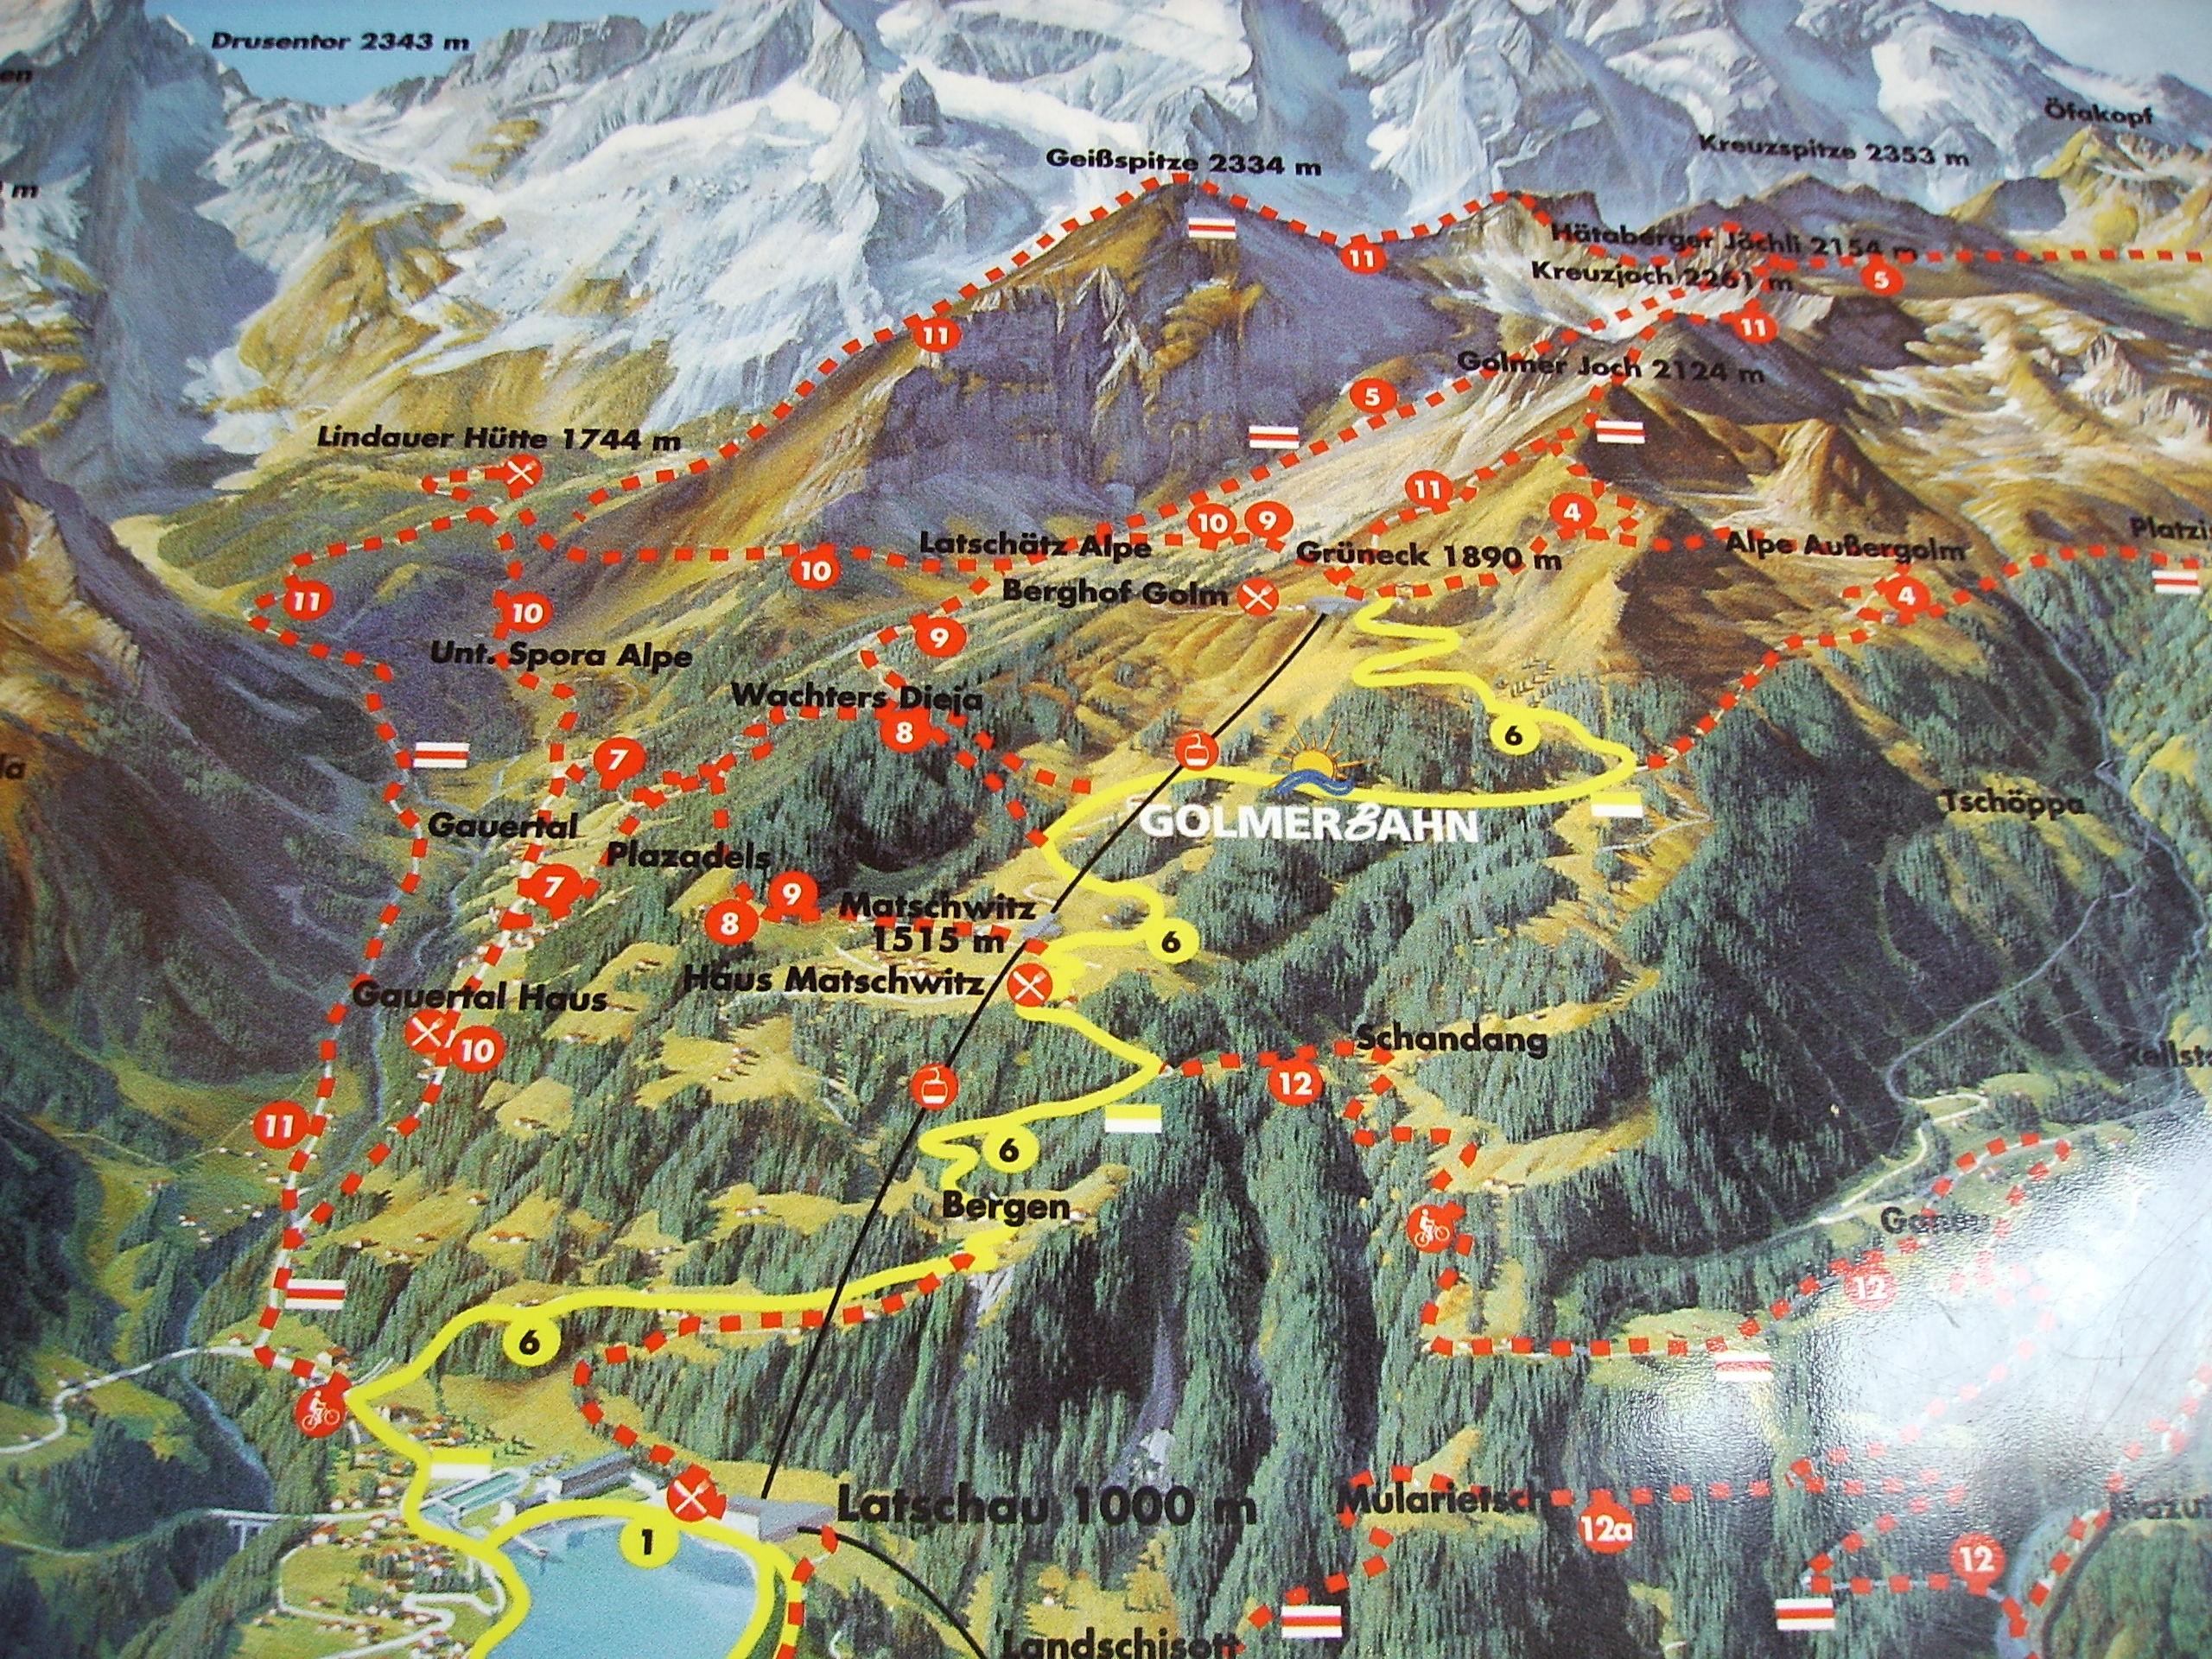 Klettersteig Map : Klettersteige im montafon